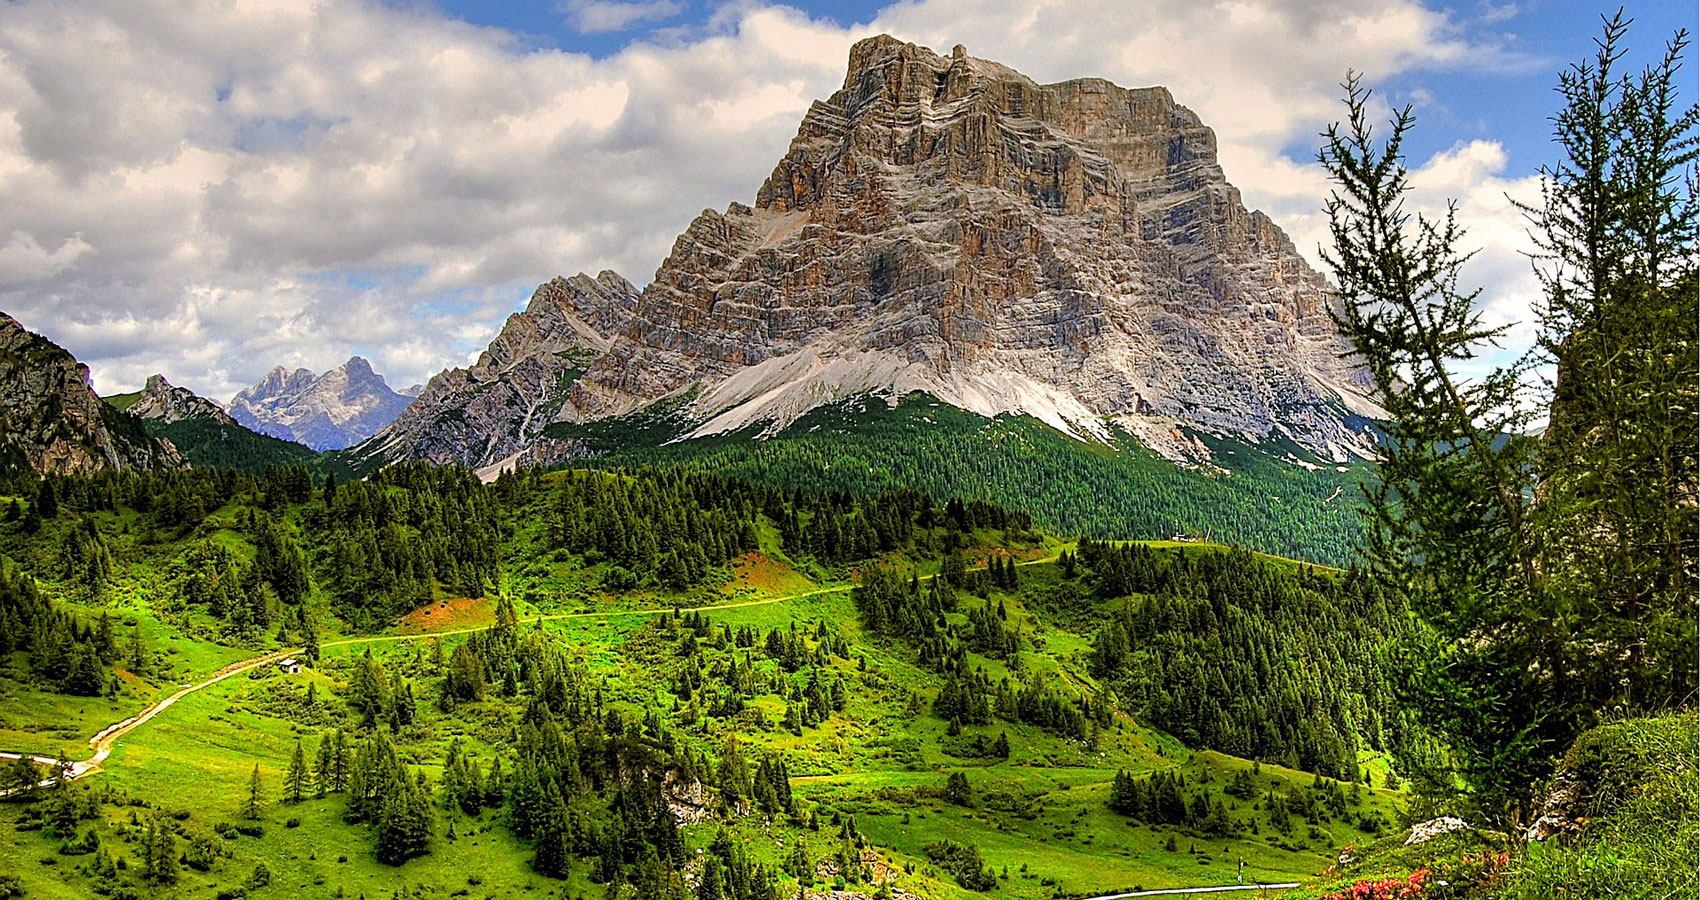 The Great Rock written by Aurora Kastaniasat Spillwords.com